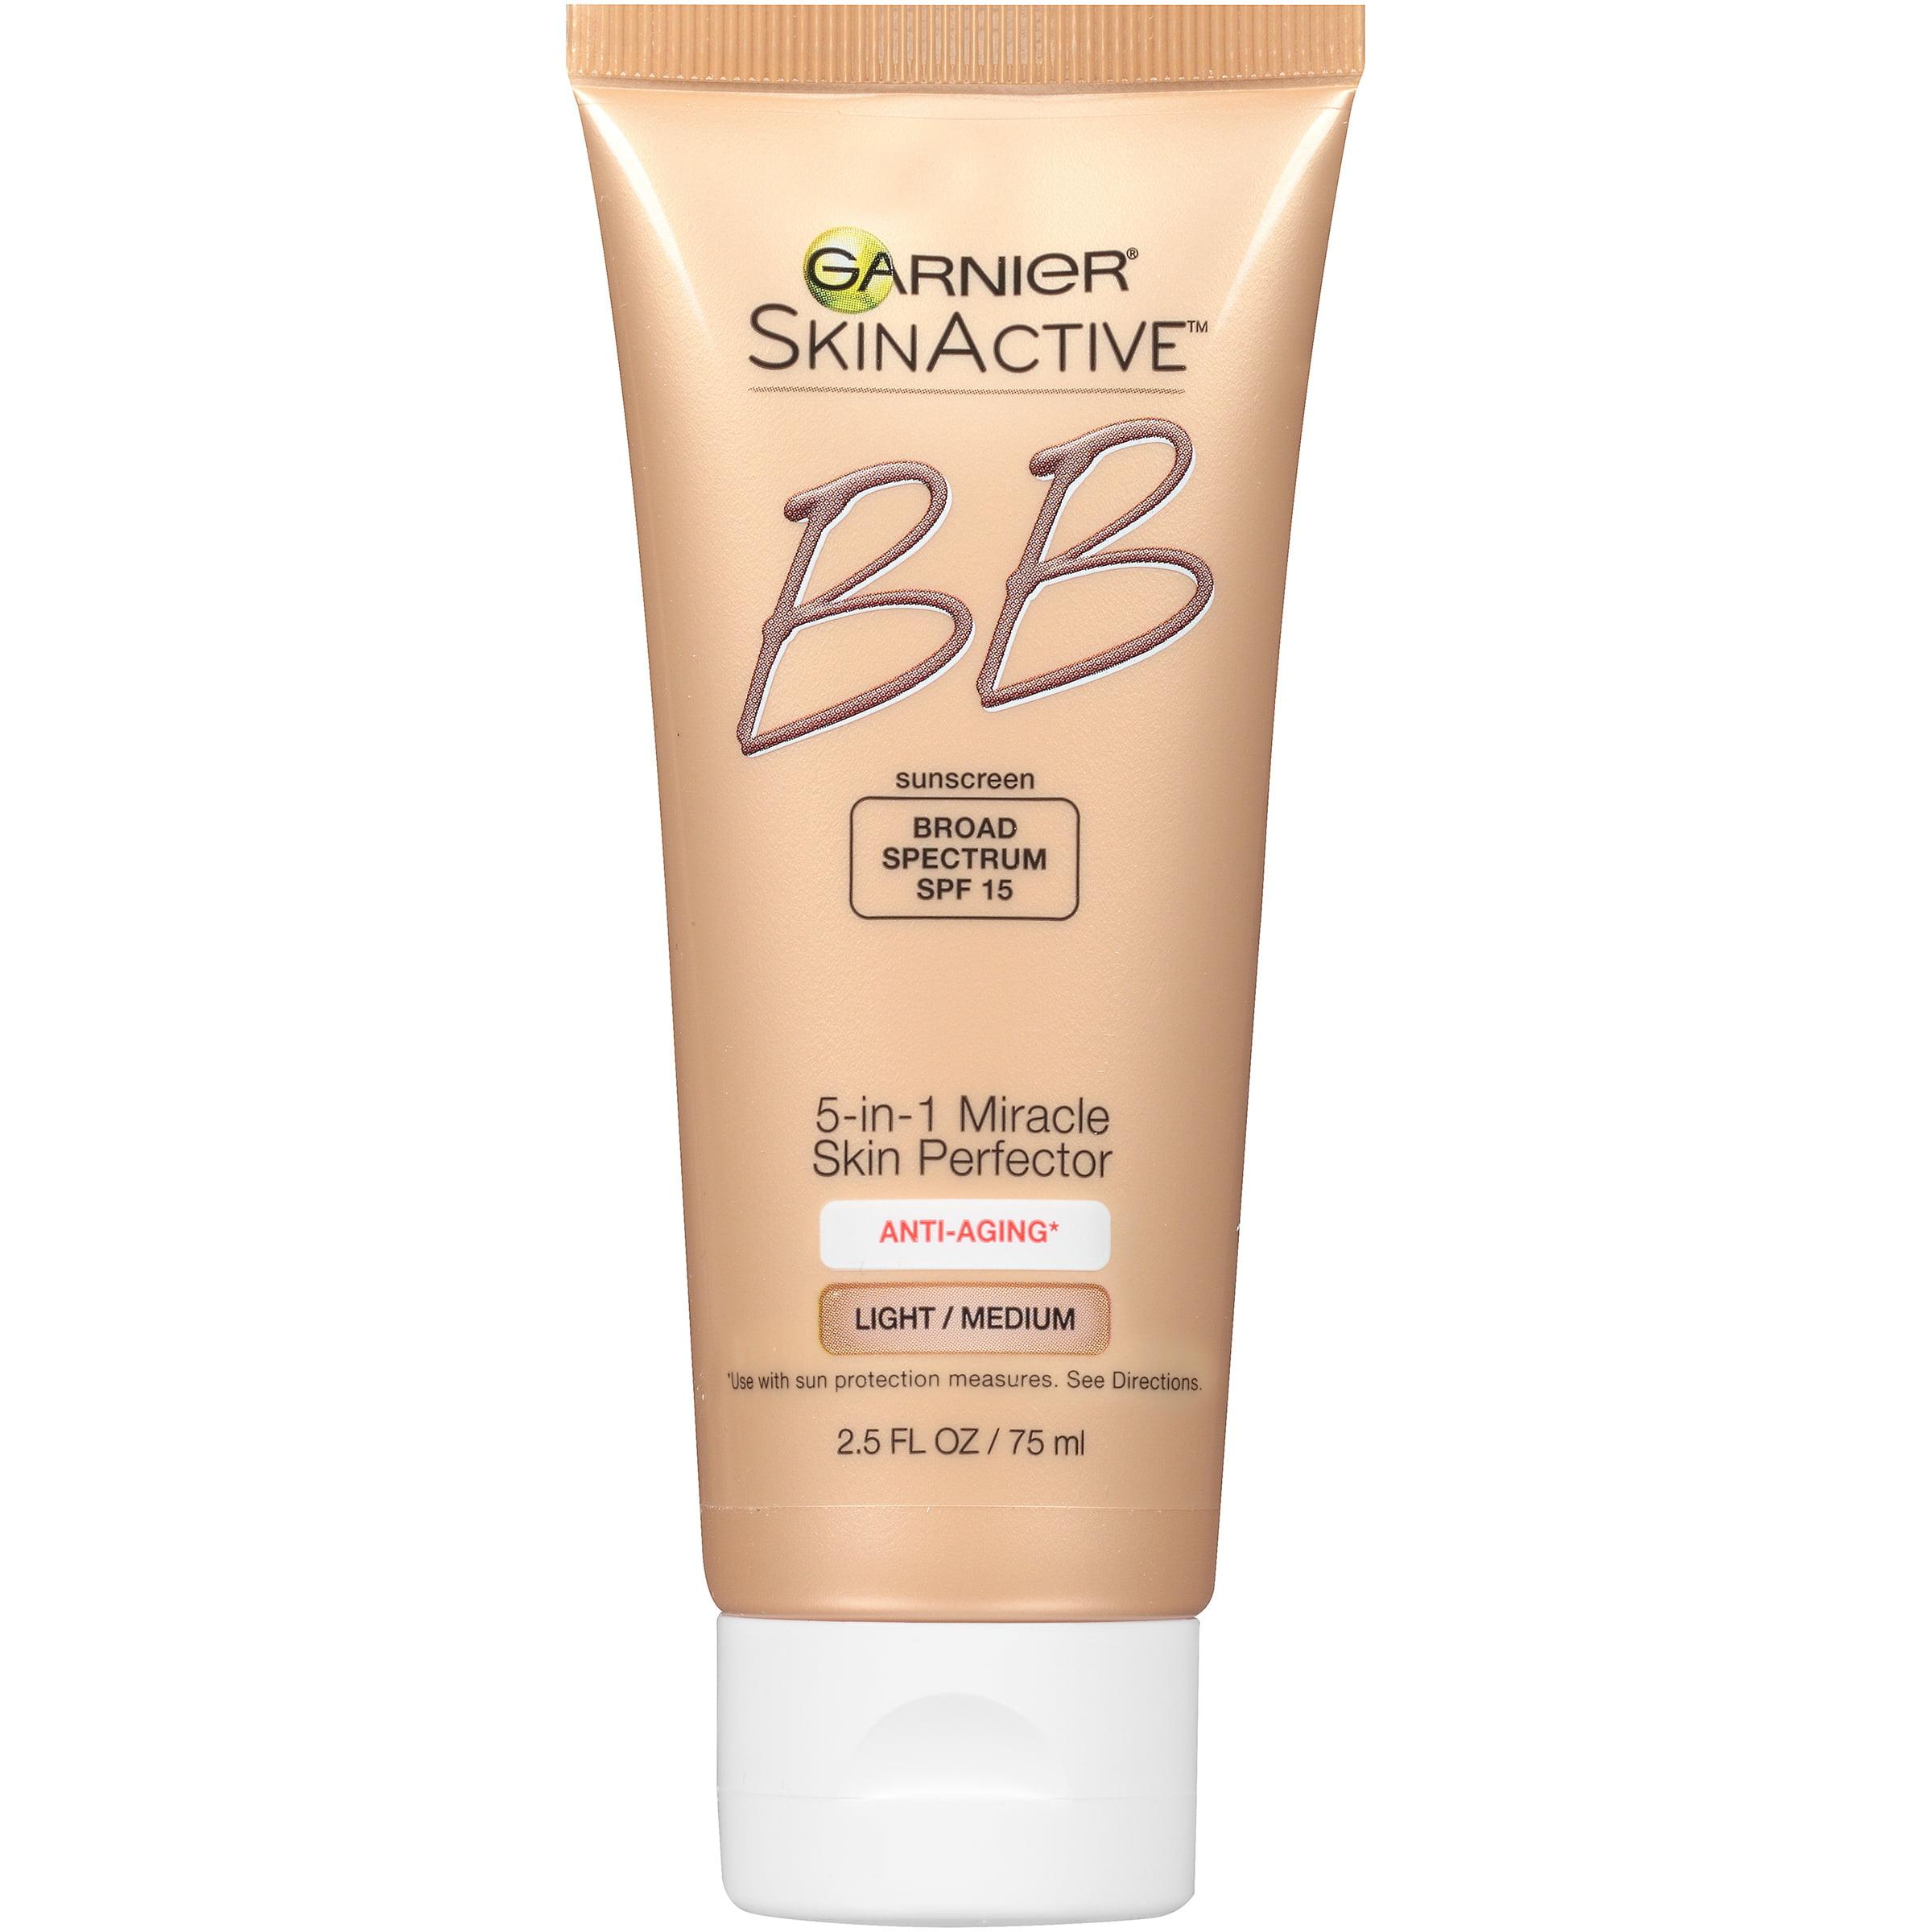 Garnier SkinActive 5-in-1 Miracle Skin Perfector BB Cream Light/Medium for Anti-Aging with SPF 15 2.5 fl. oz. Box